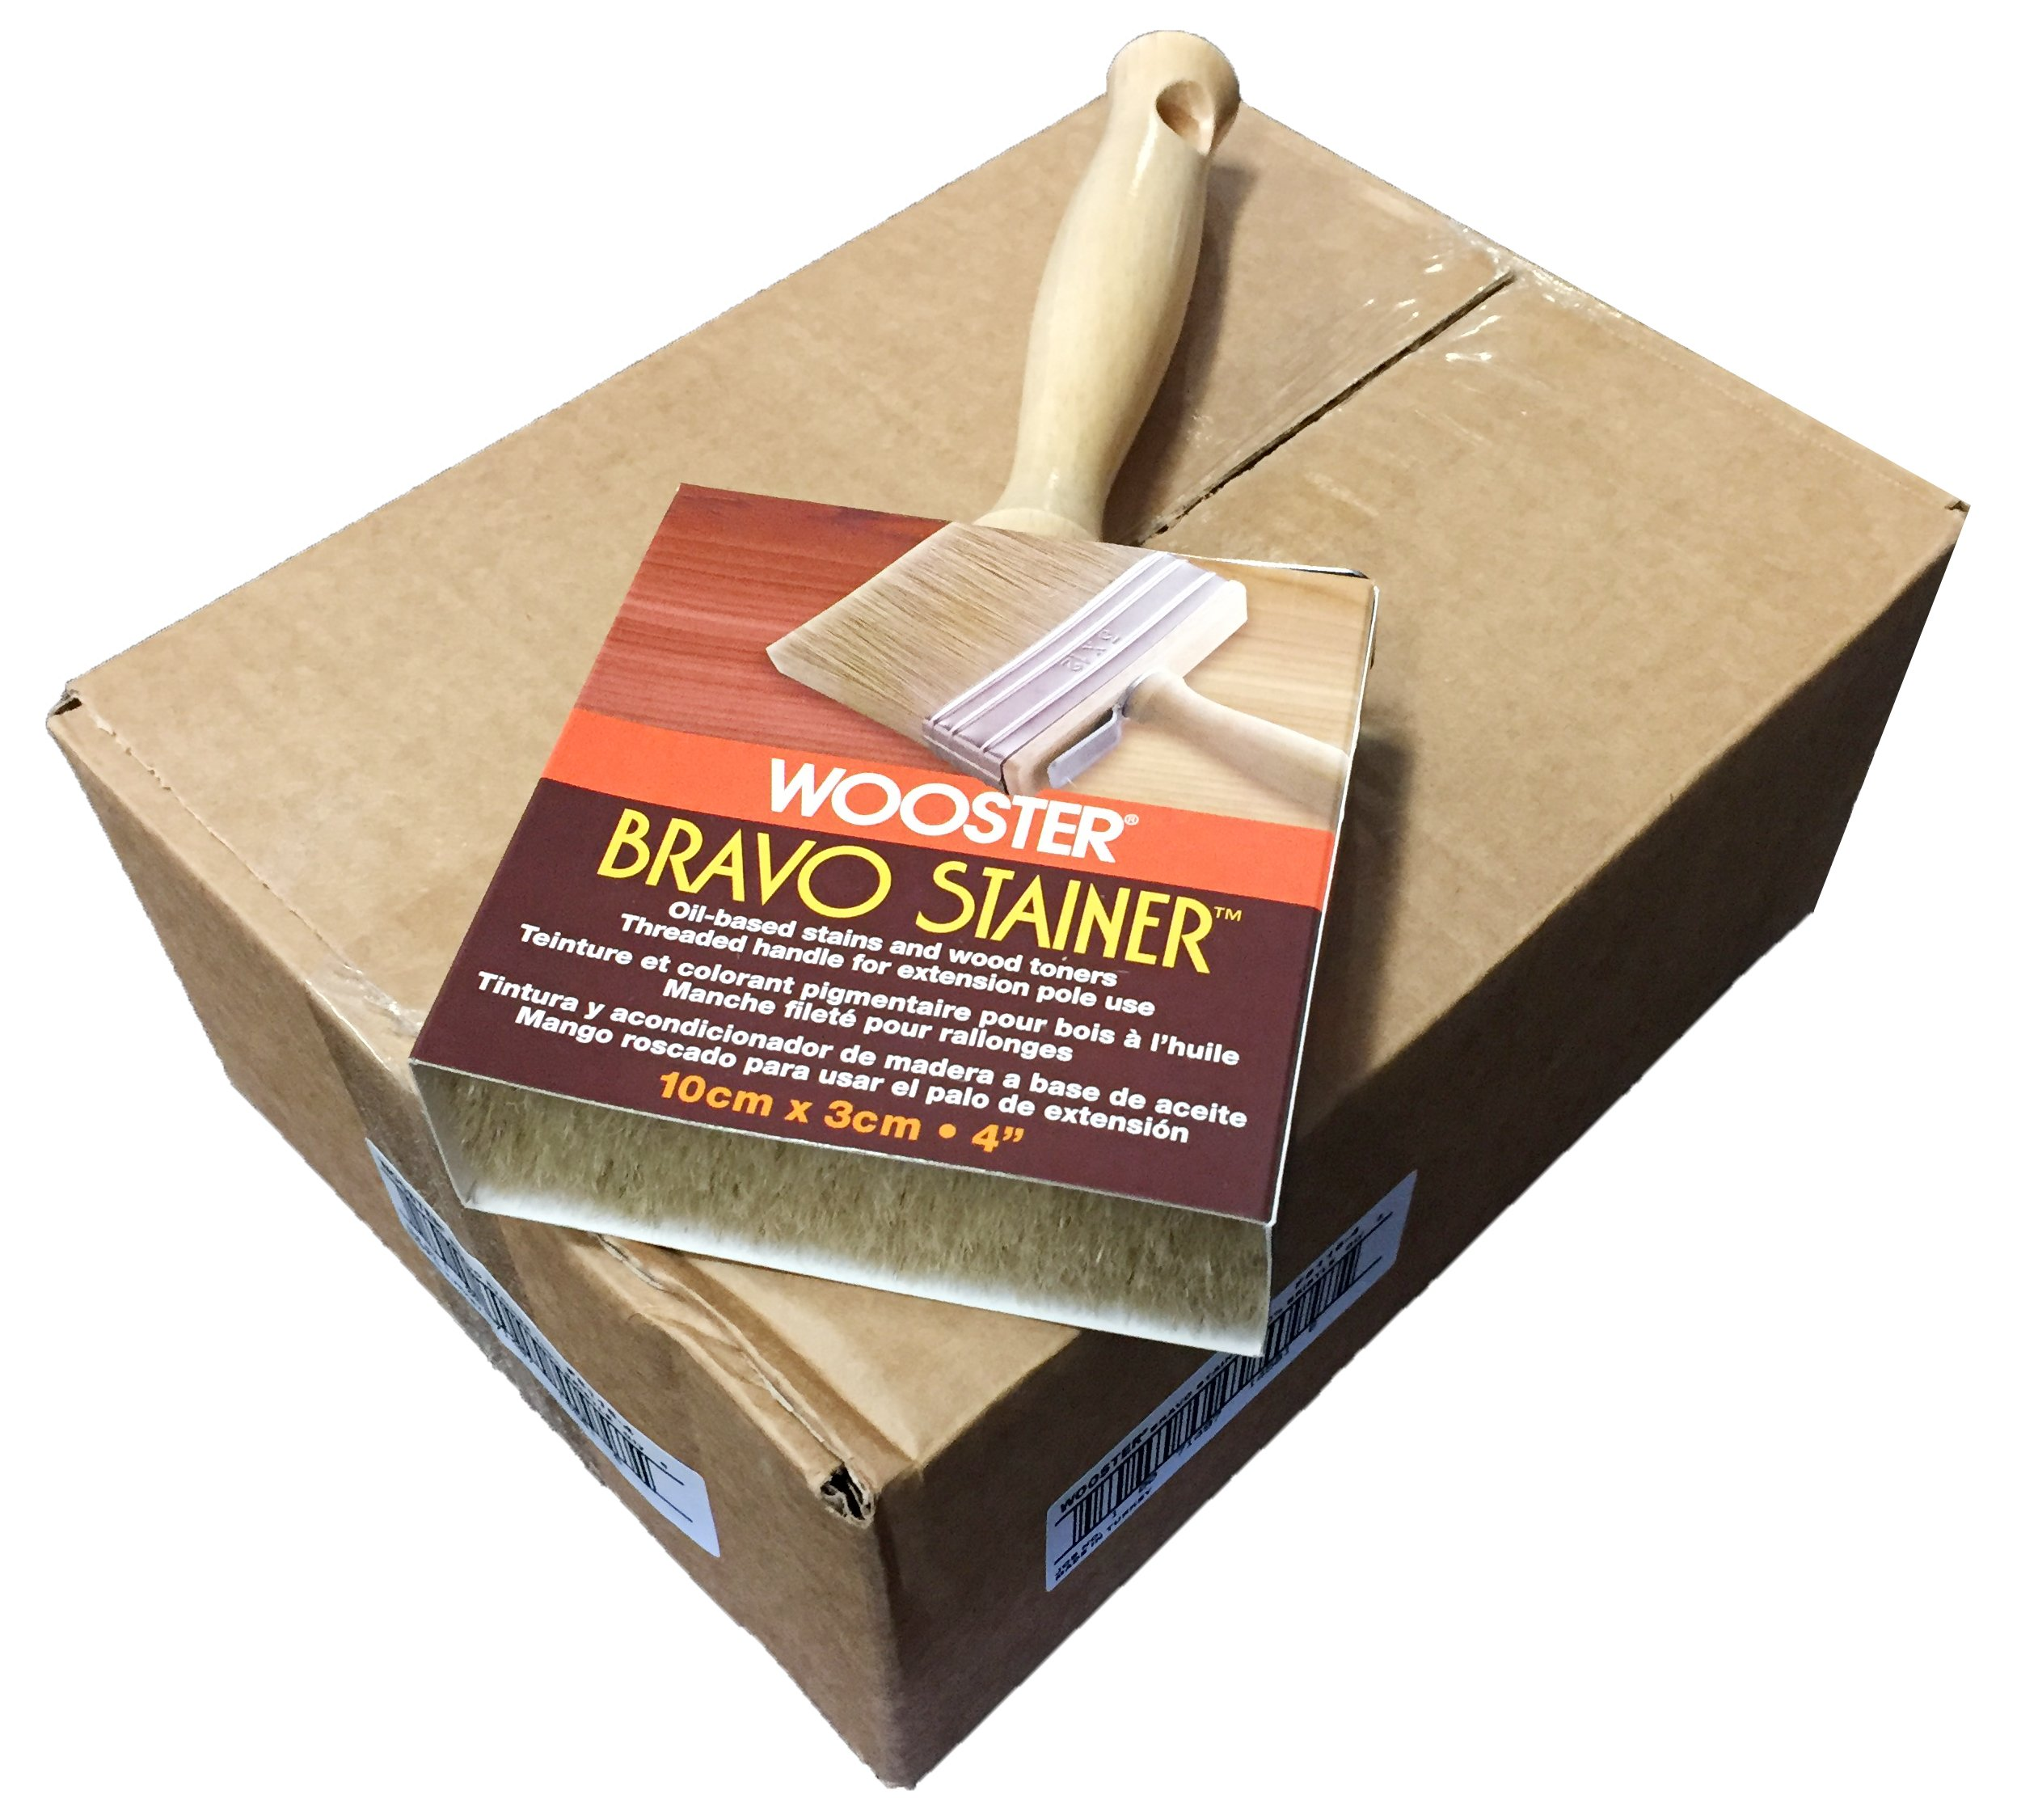 Wooster Brush F5116-4 Bravo Stainer Stain Brush, Pack of 6